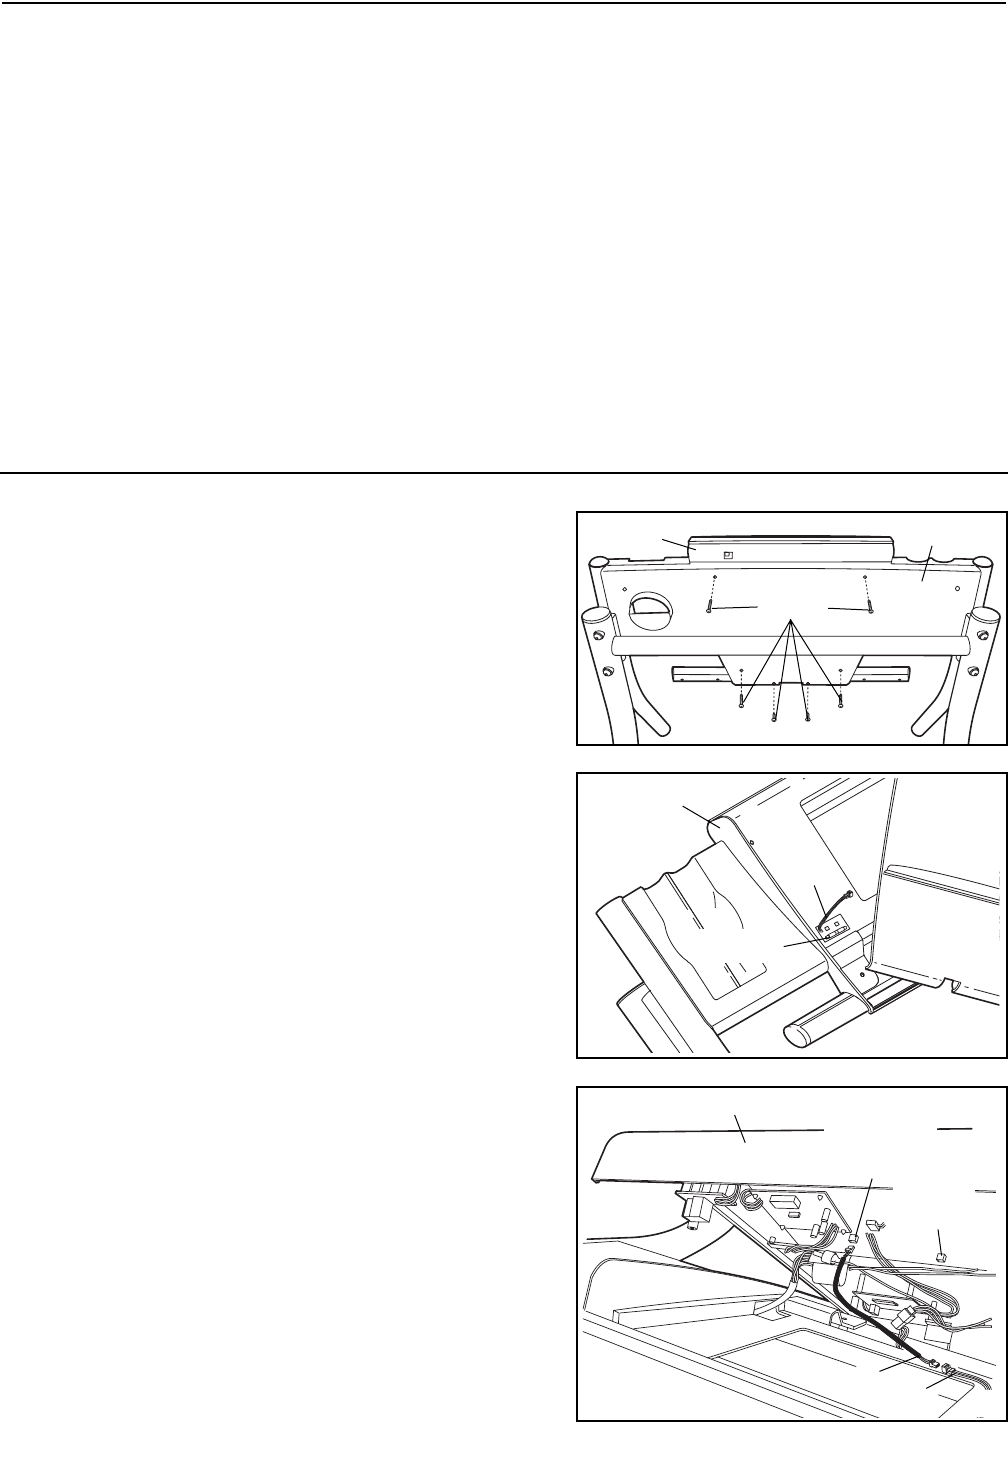 Handleiding Pro Form Pfmc8982 Pagina 1 Van 12 English Proform Treadmill Wiring Diagram 2